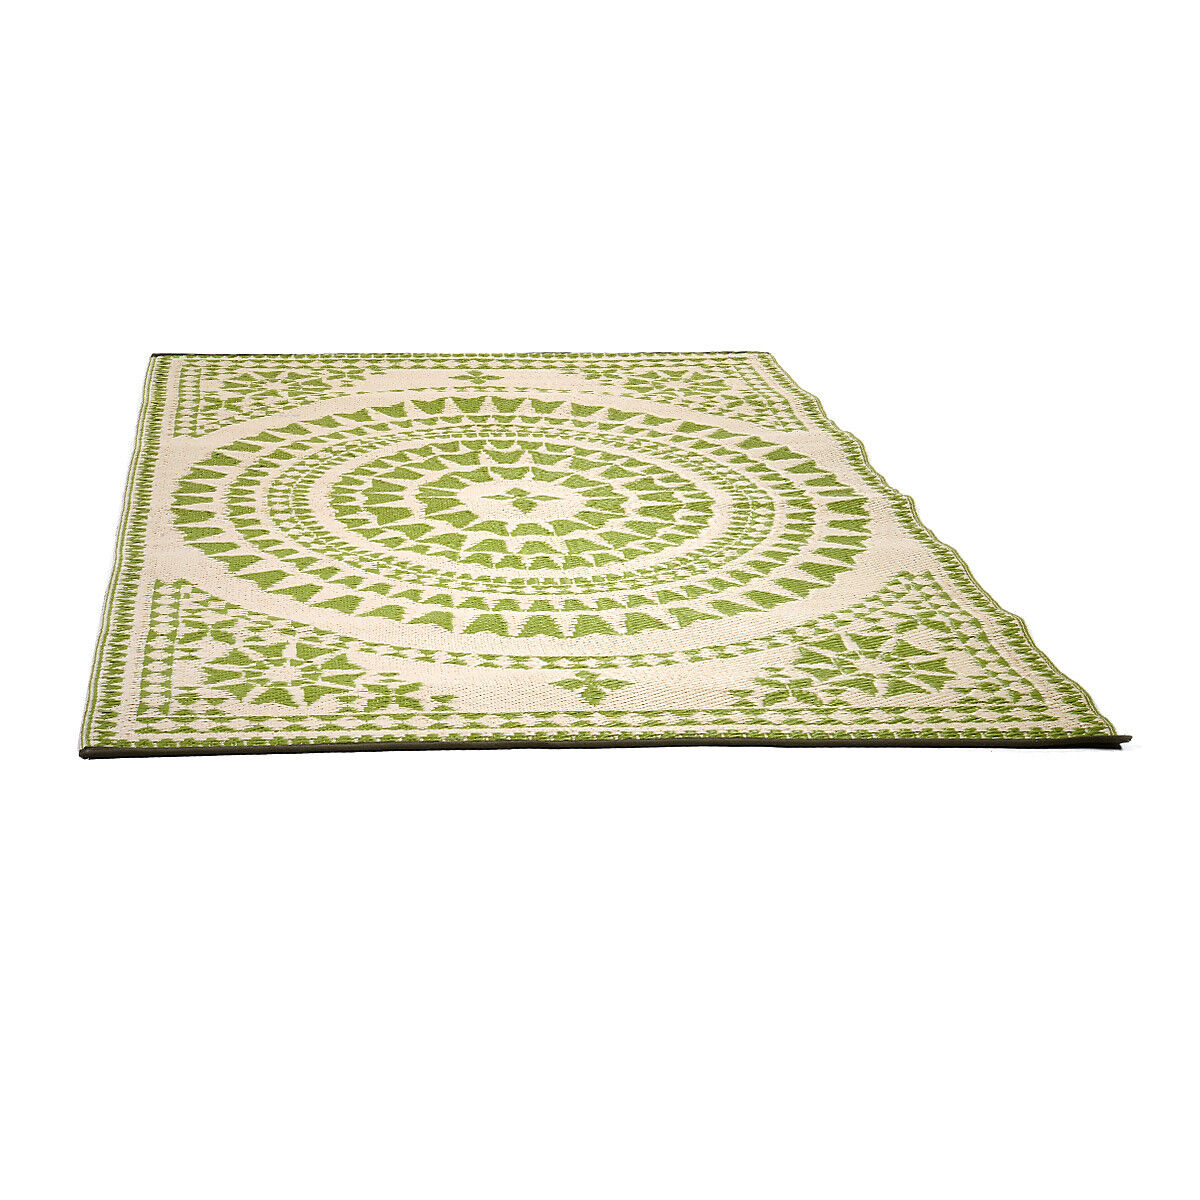 Teppich Outdoor FLORAL Kunststoff hellgrün ca B150 x L